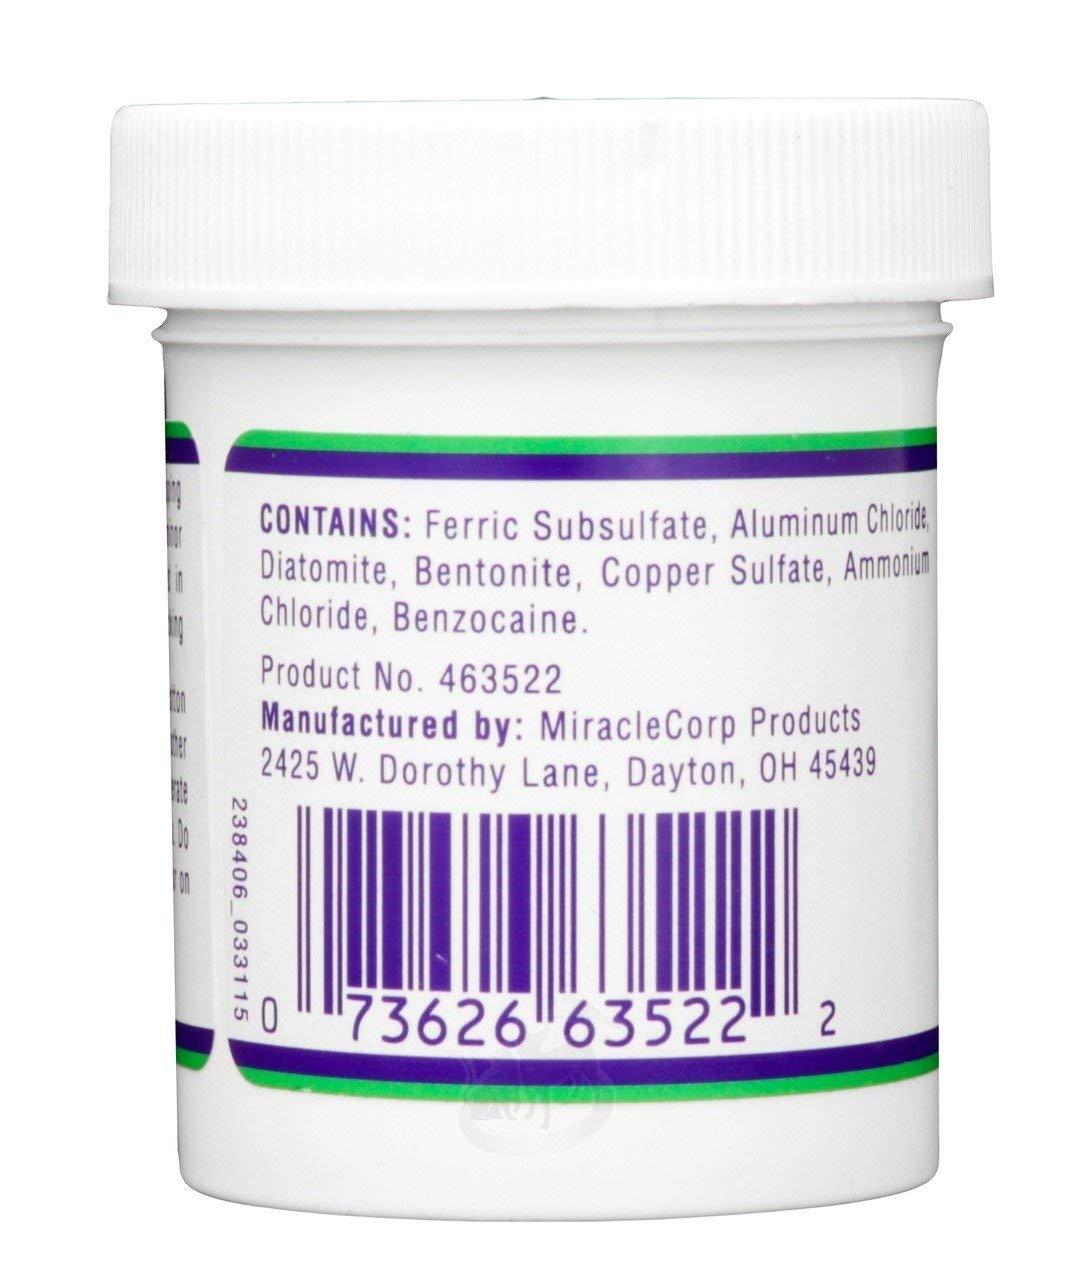 Styptic Powder Kwik Stop Benzocaine Bleed Stop 42 Gram by Styptic Powder